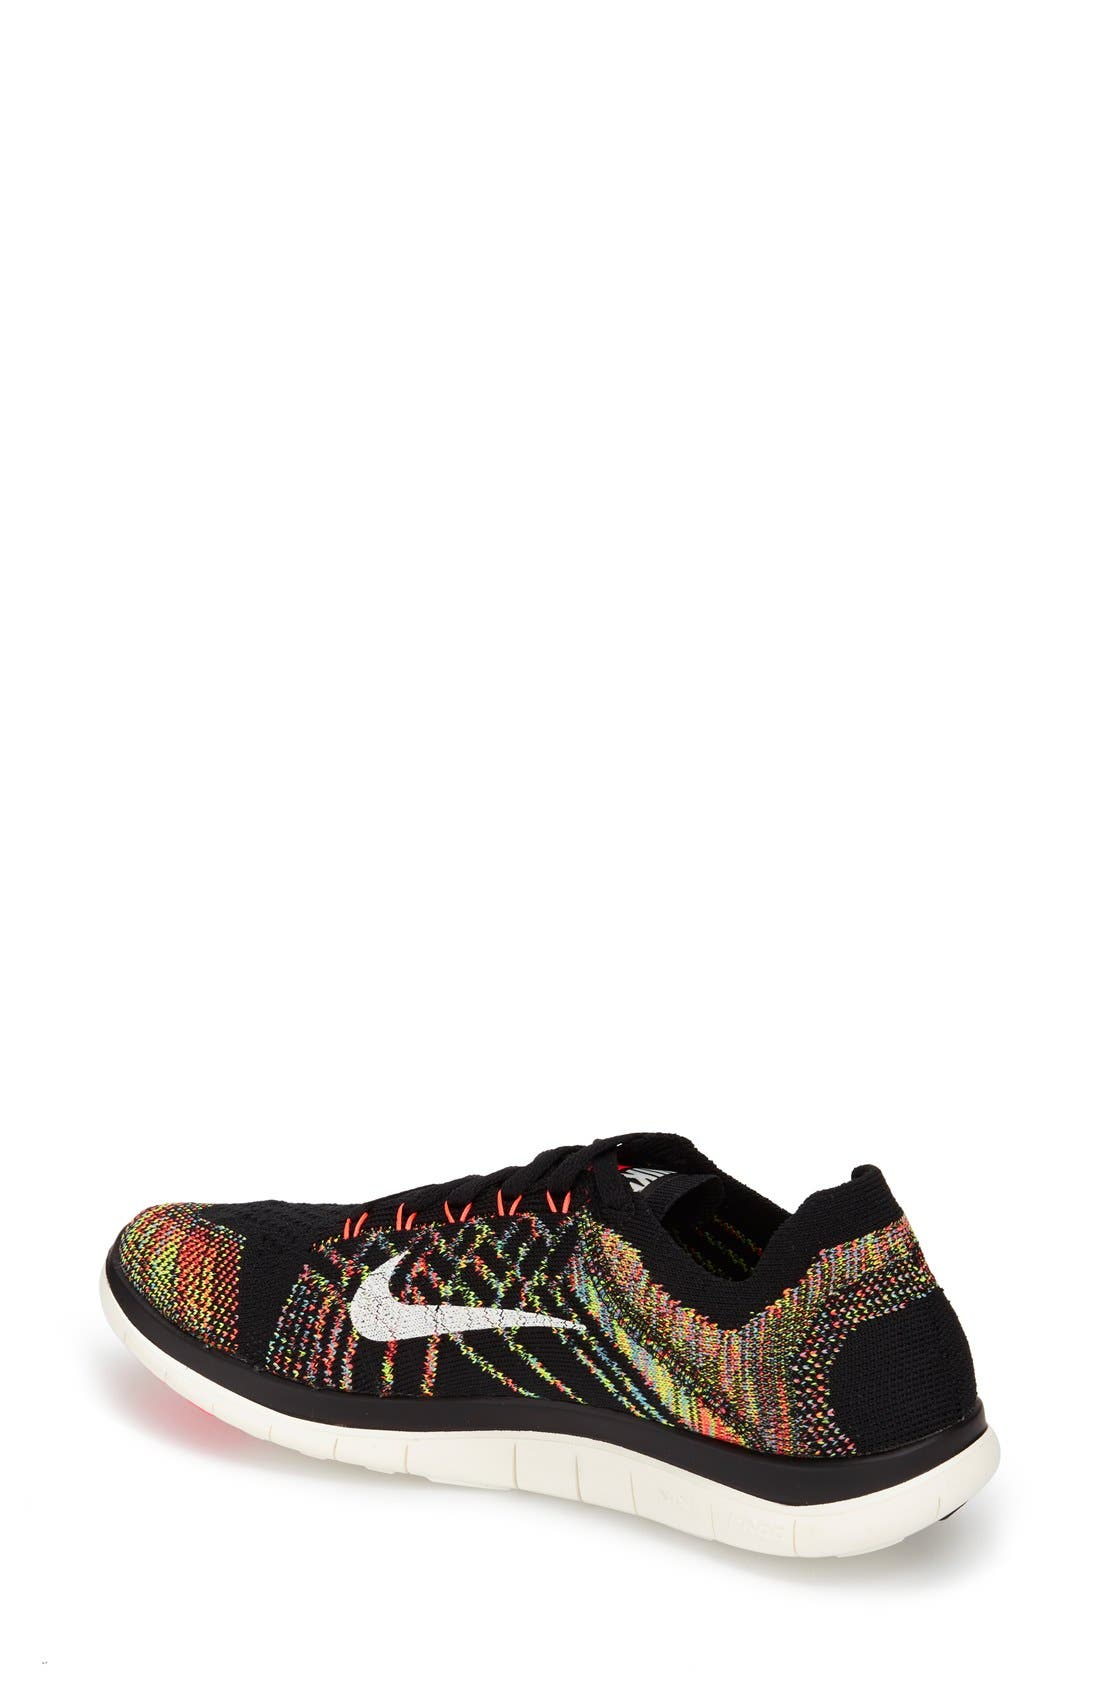 'Free 4.0 Flyknit' Running Shoe,                             Alternate thumbnail 2, color,                             Black/ Orange/ Blue